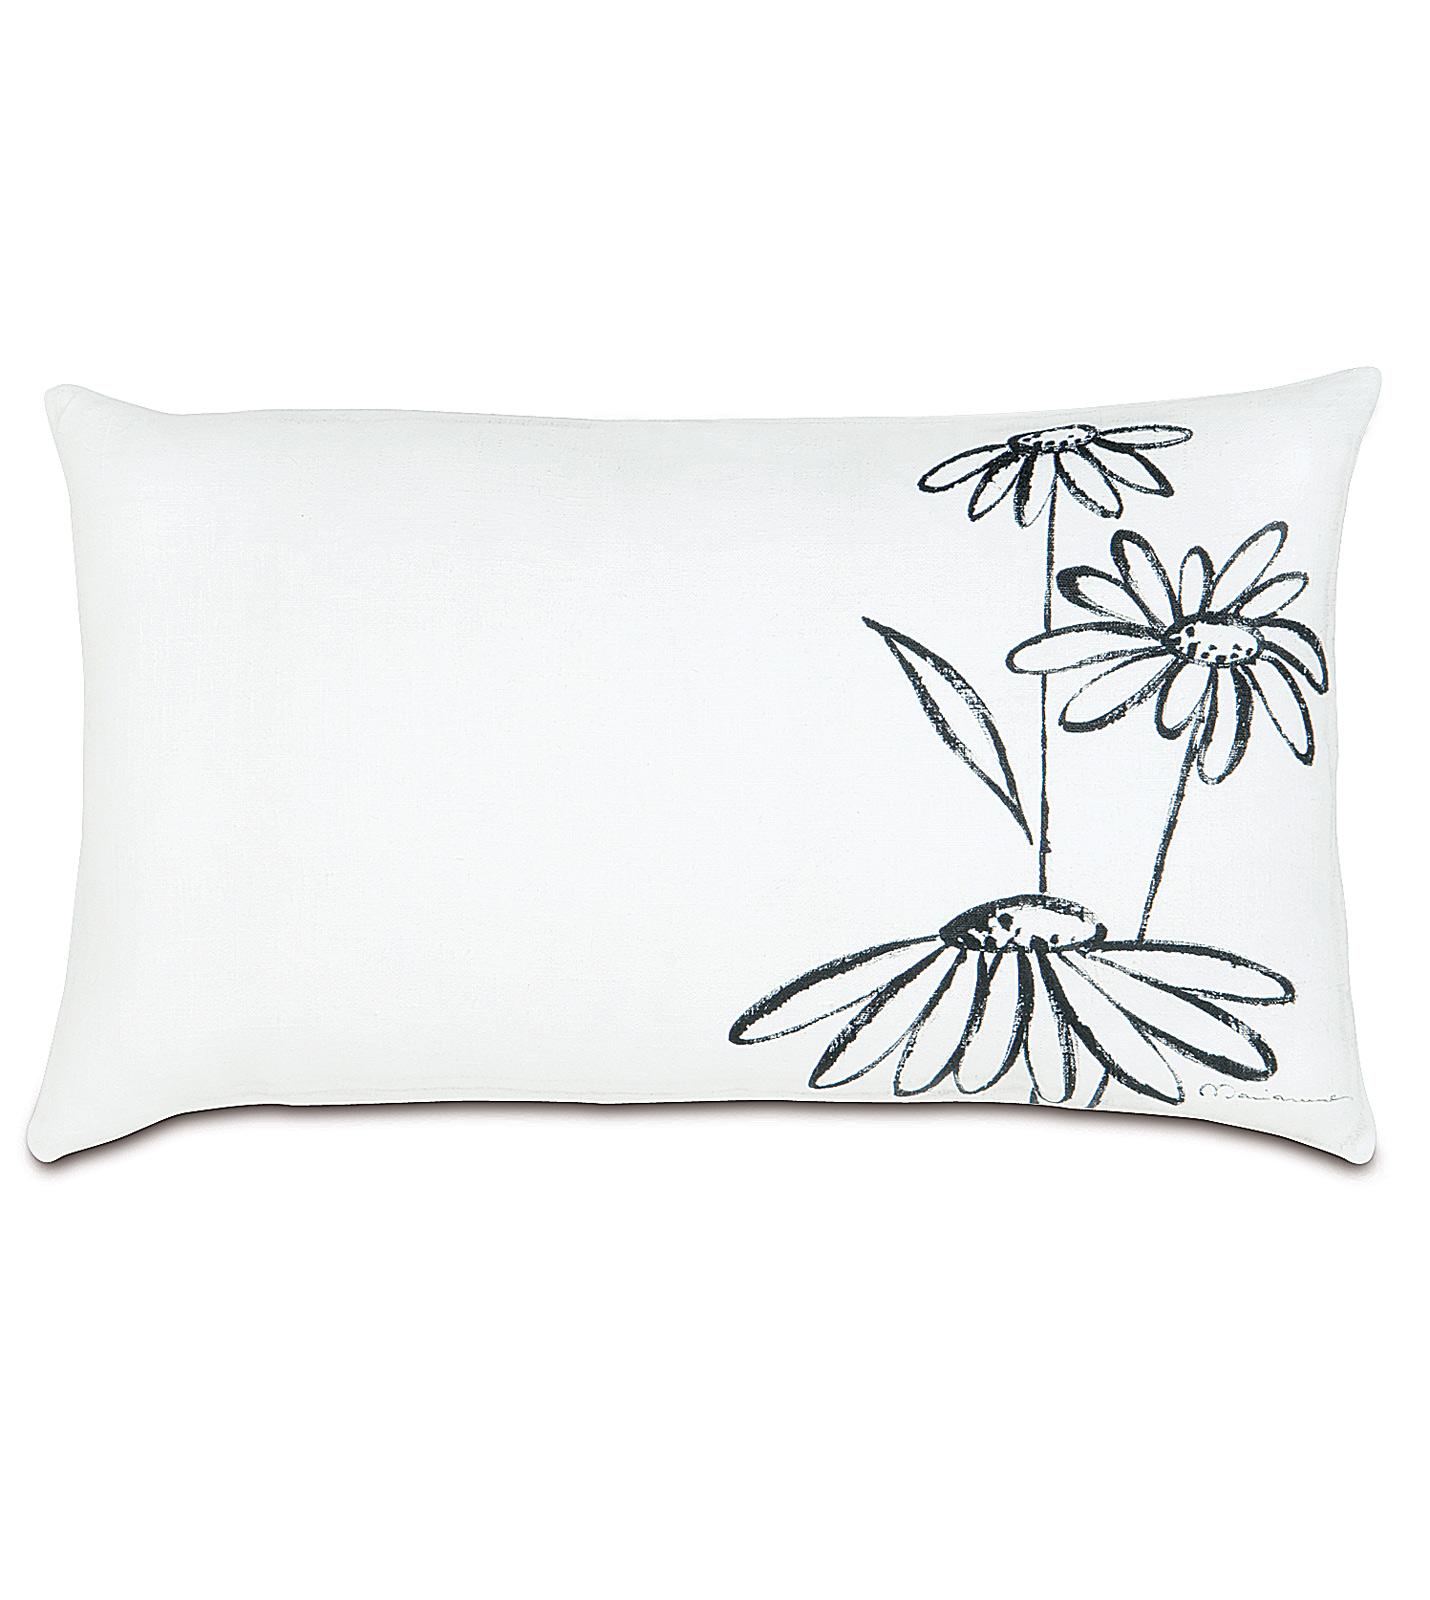 Daisy Outline Pillow Outline